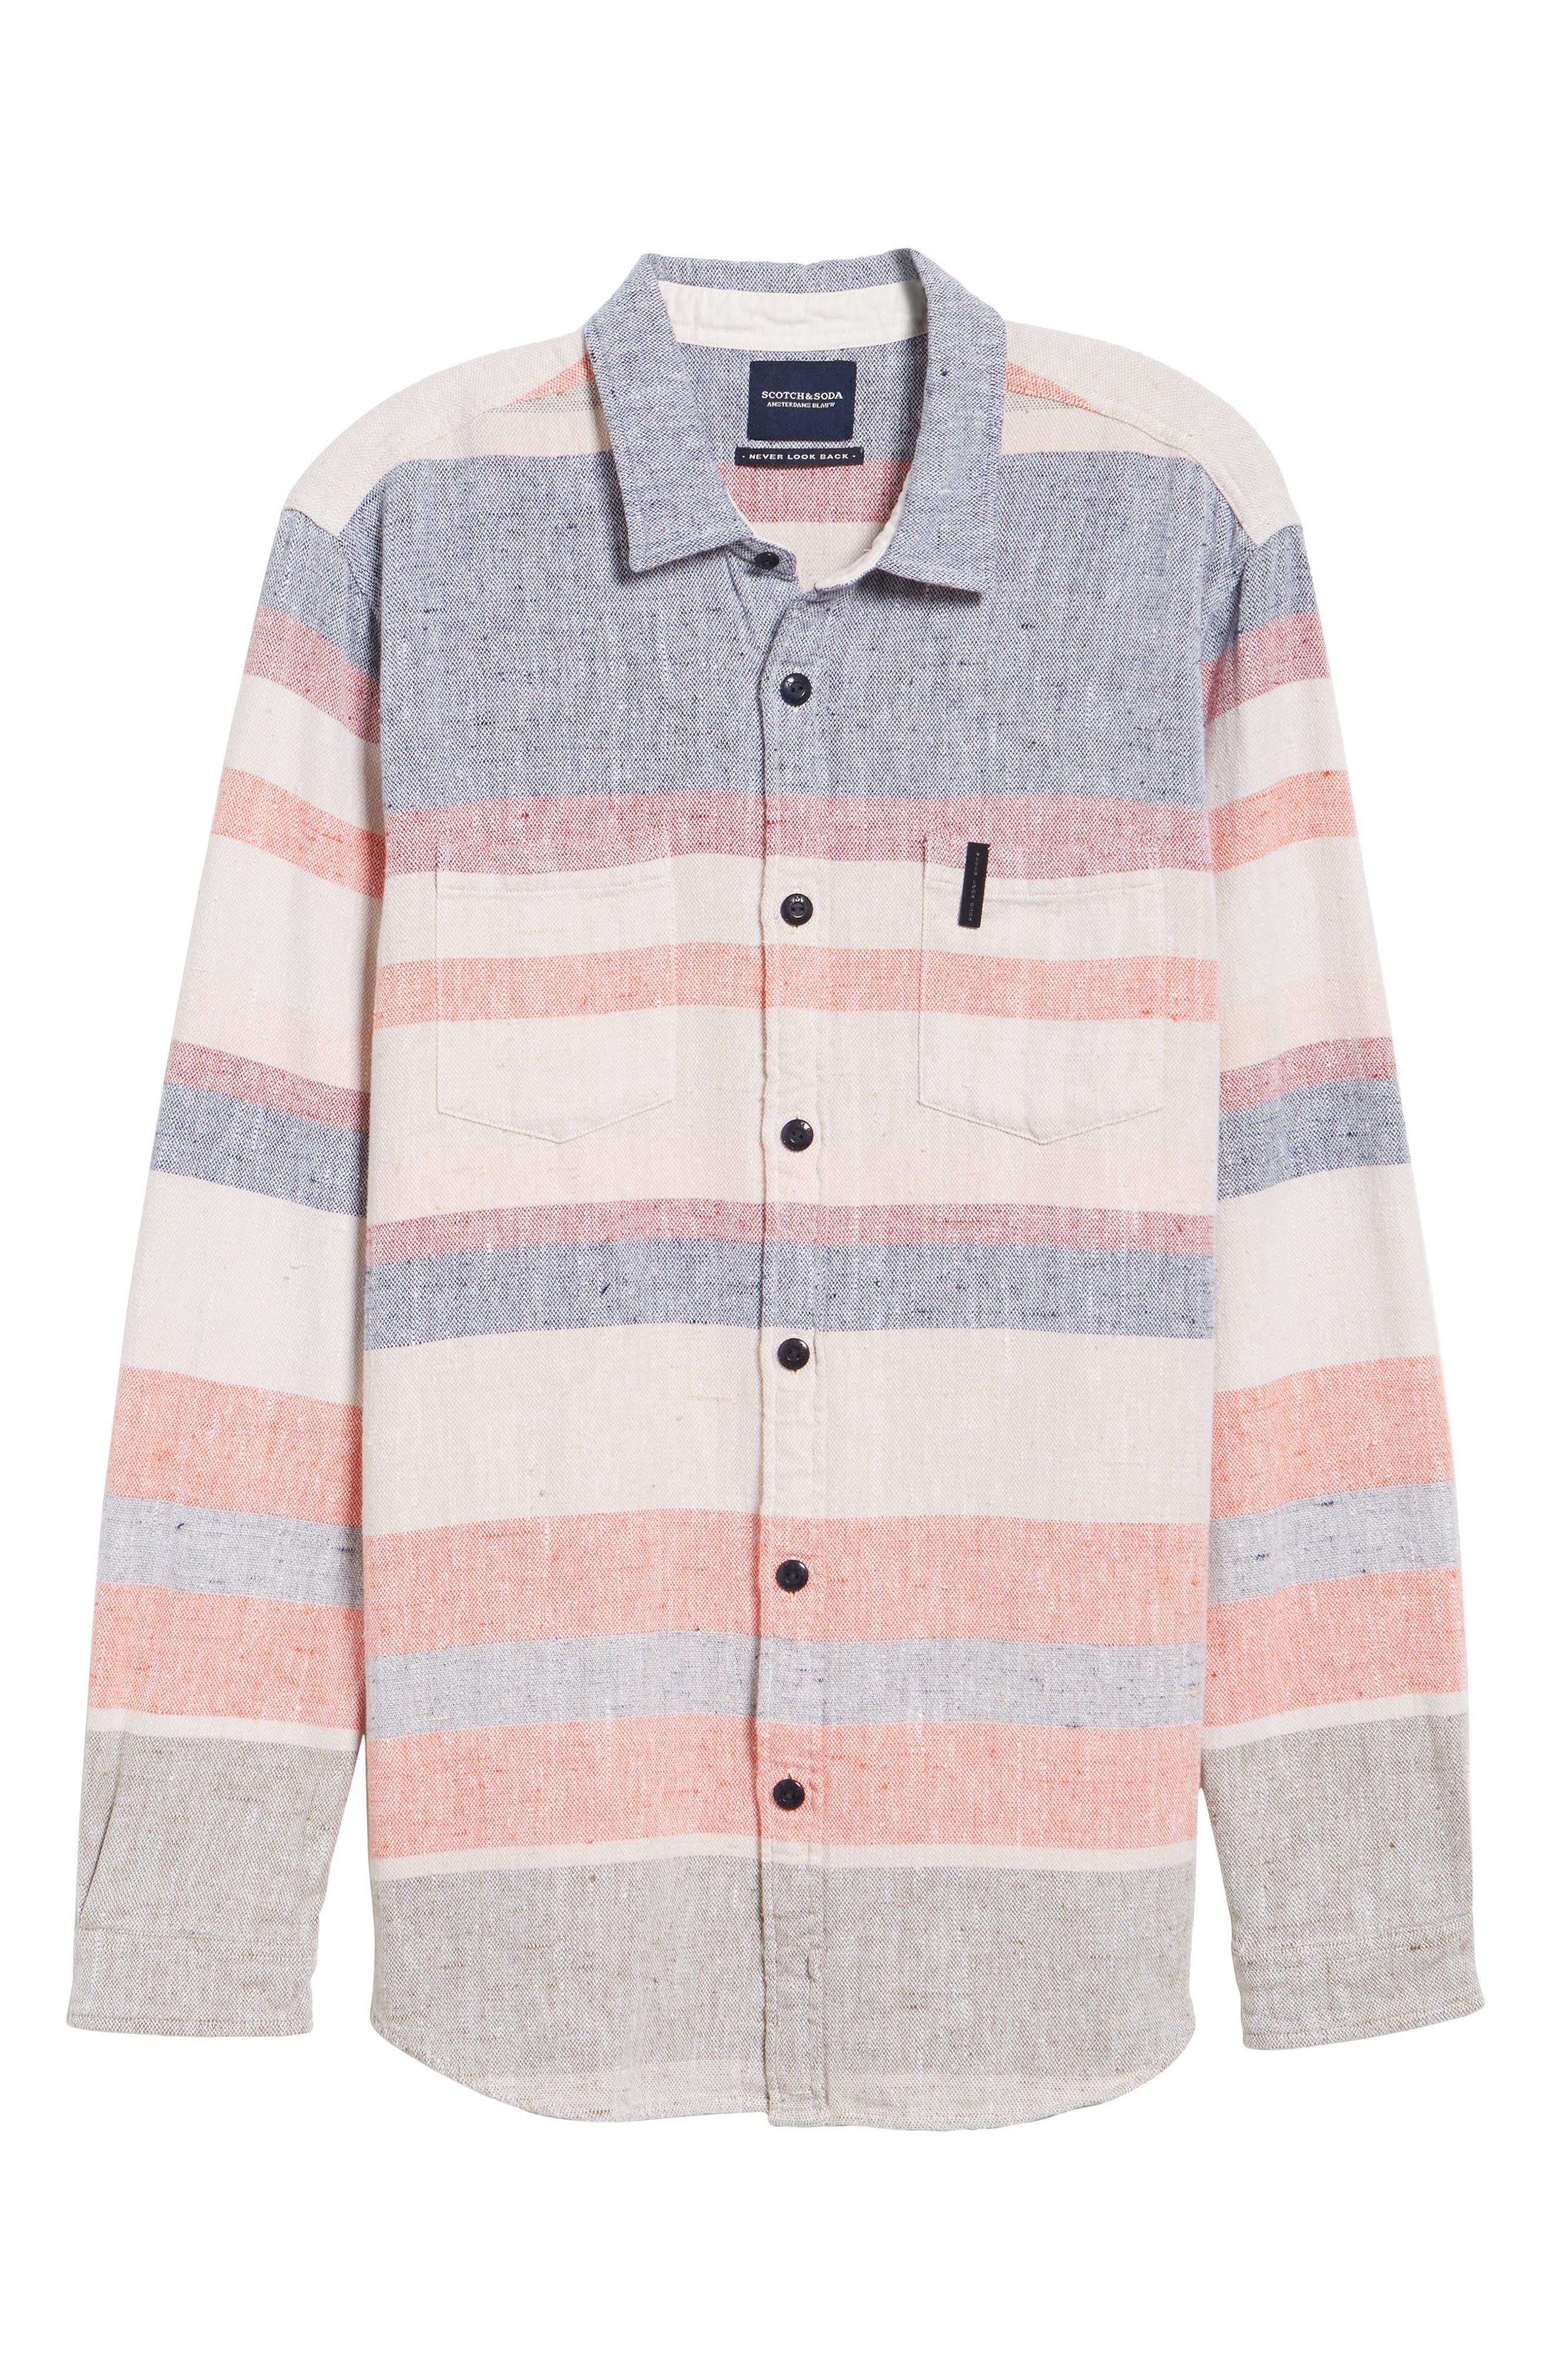 Amsterdams Summery Chunk Shirt,                             Alternate thumbnail 6, color,                             020